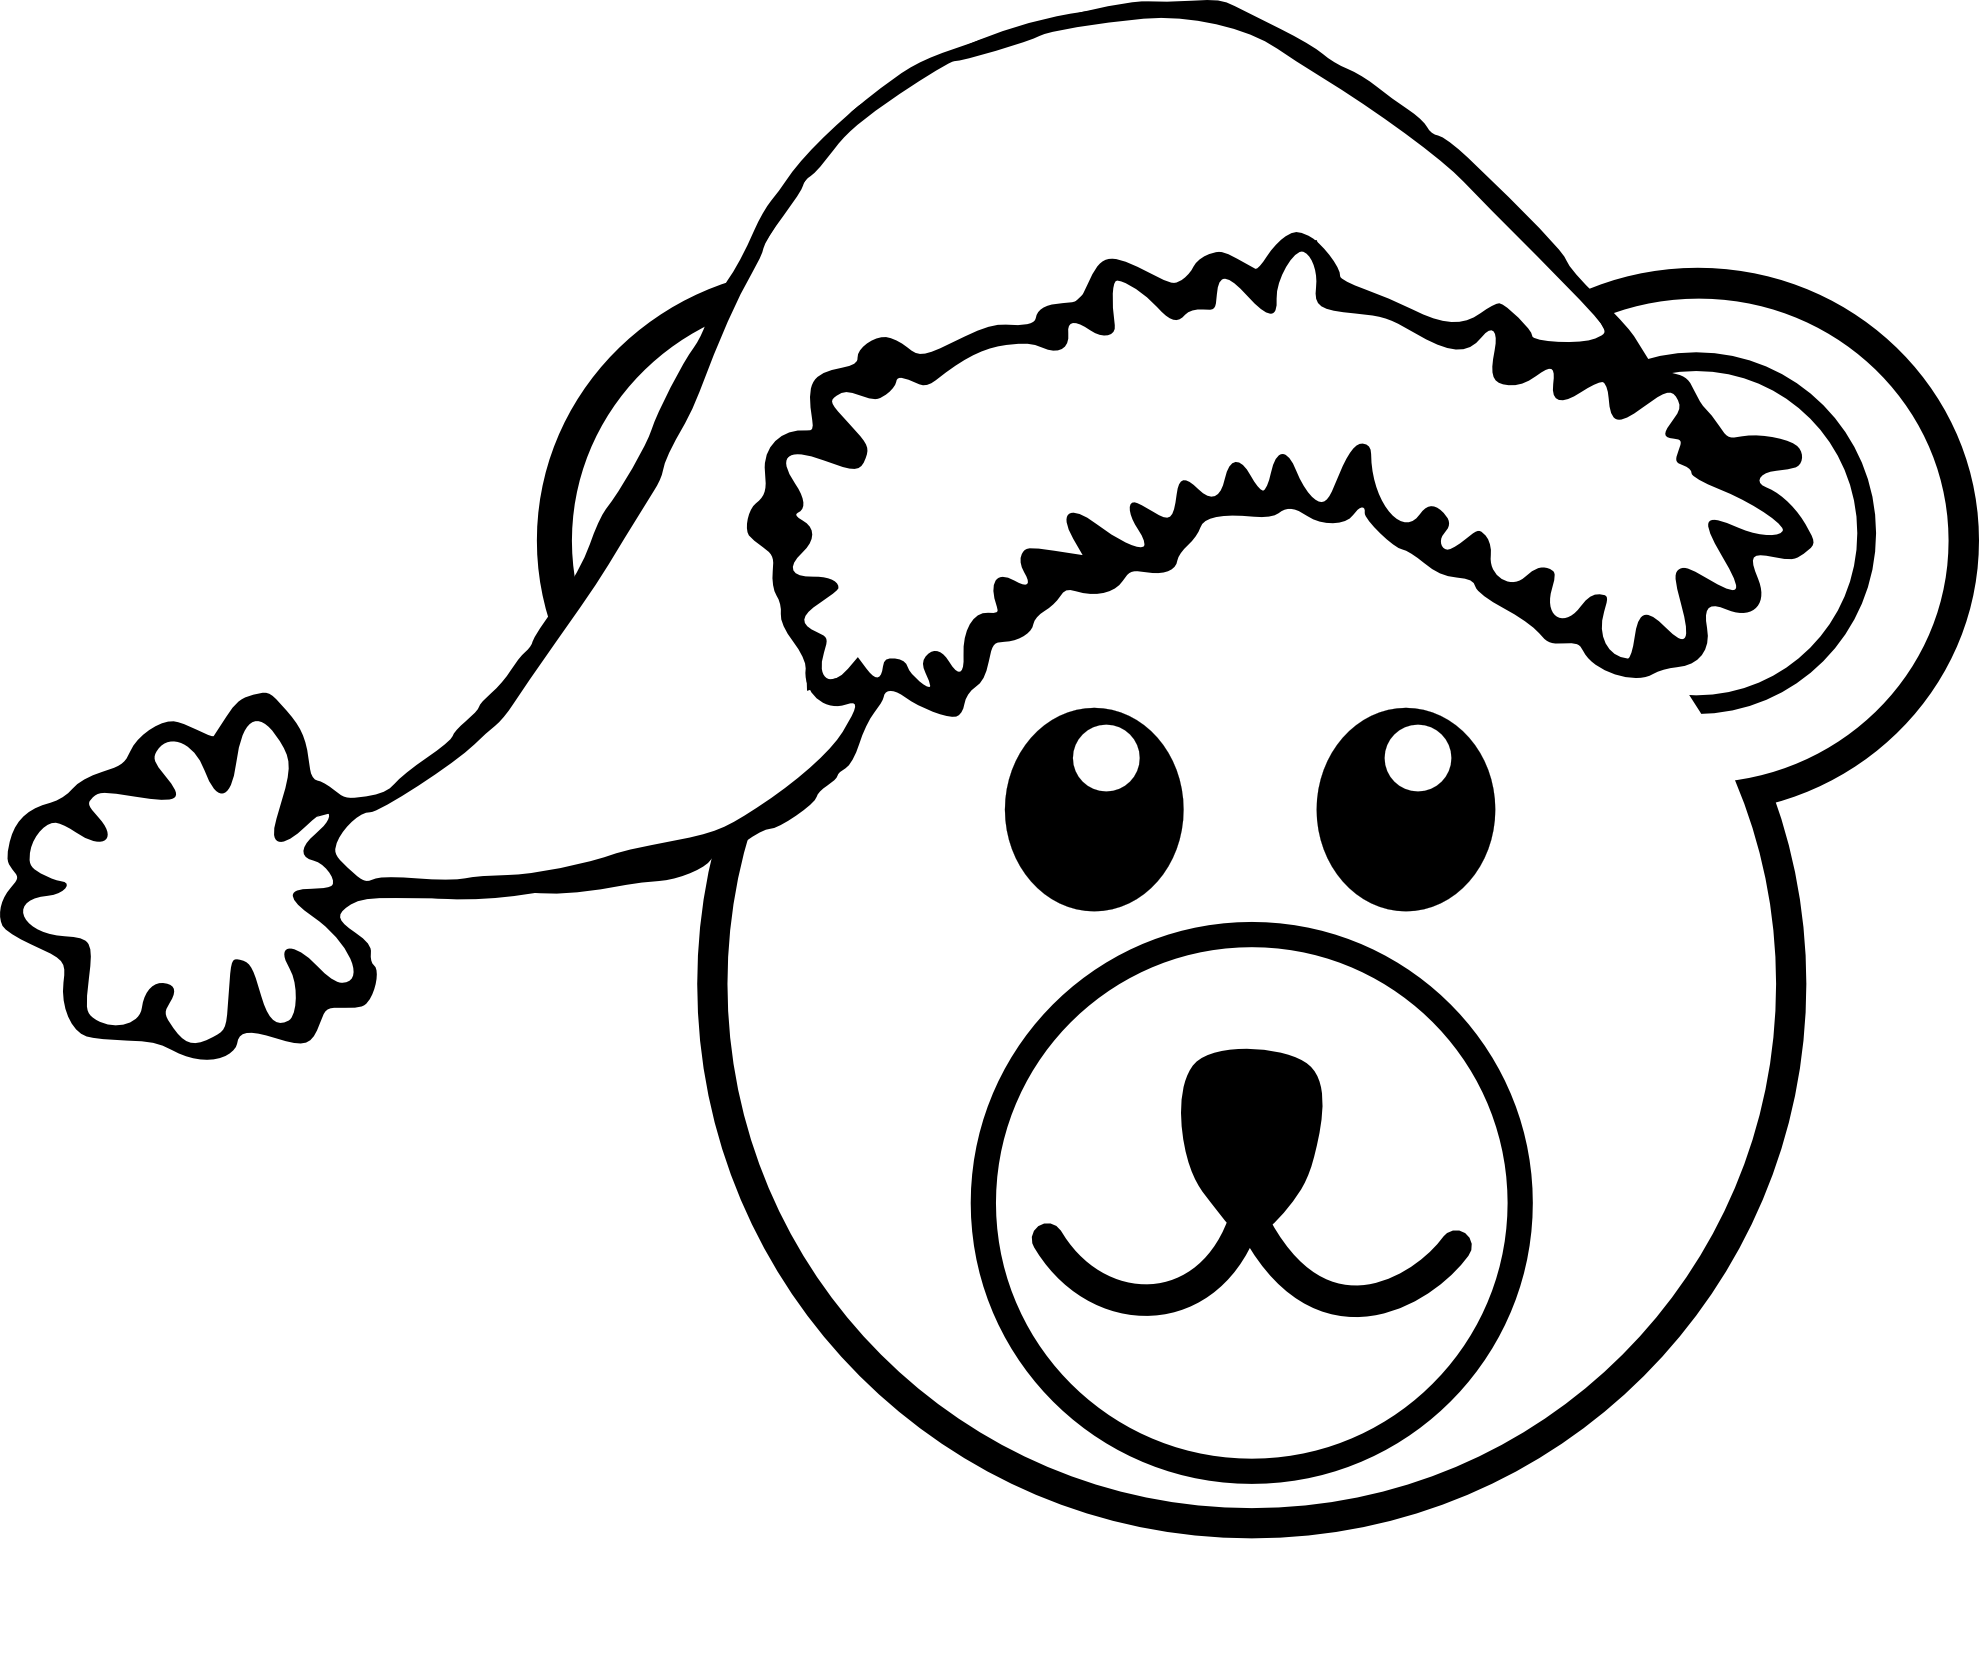 clip free Snowman face clipart black and white. Teddy bear panda free